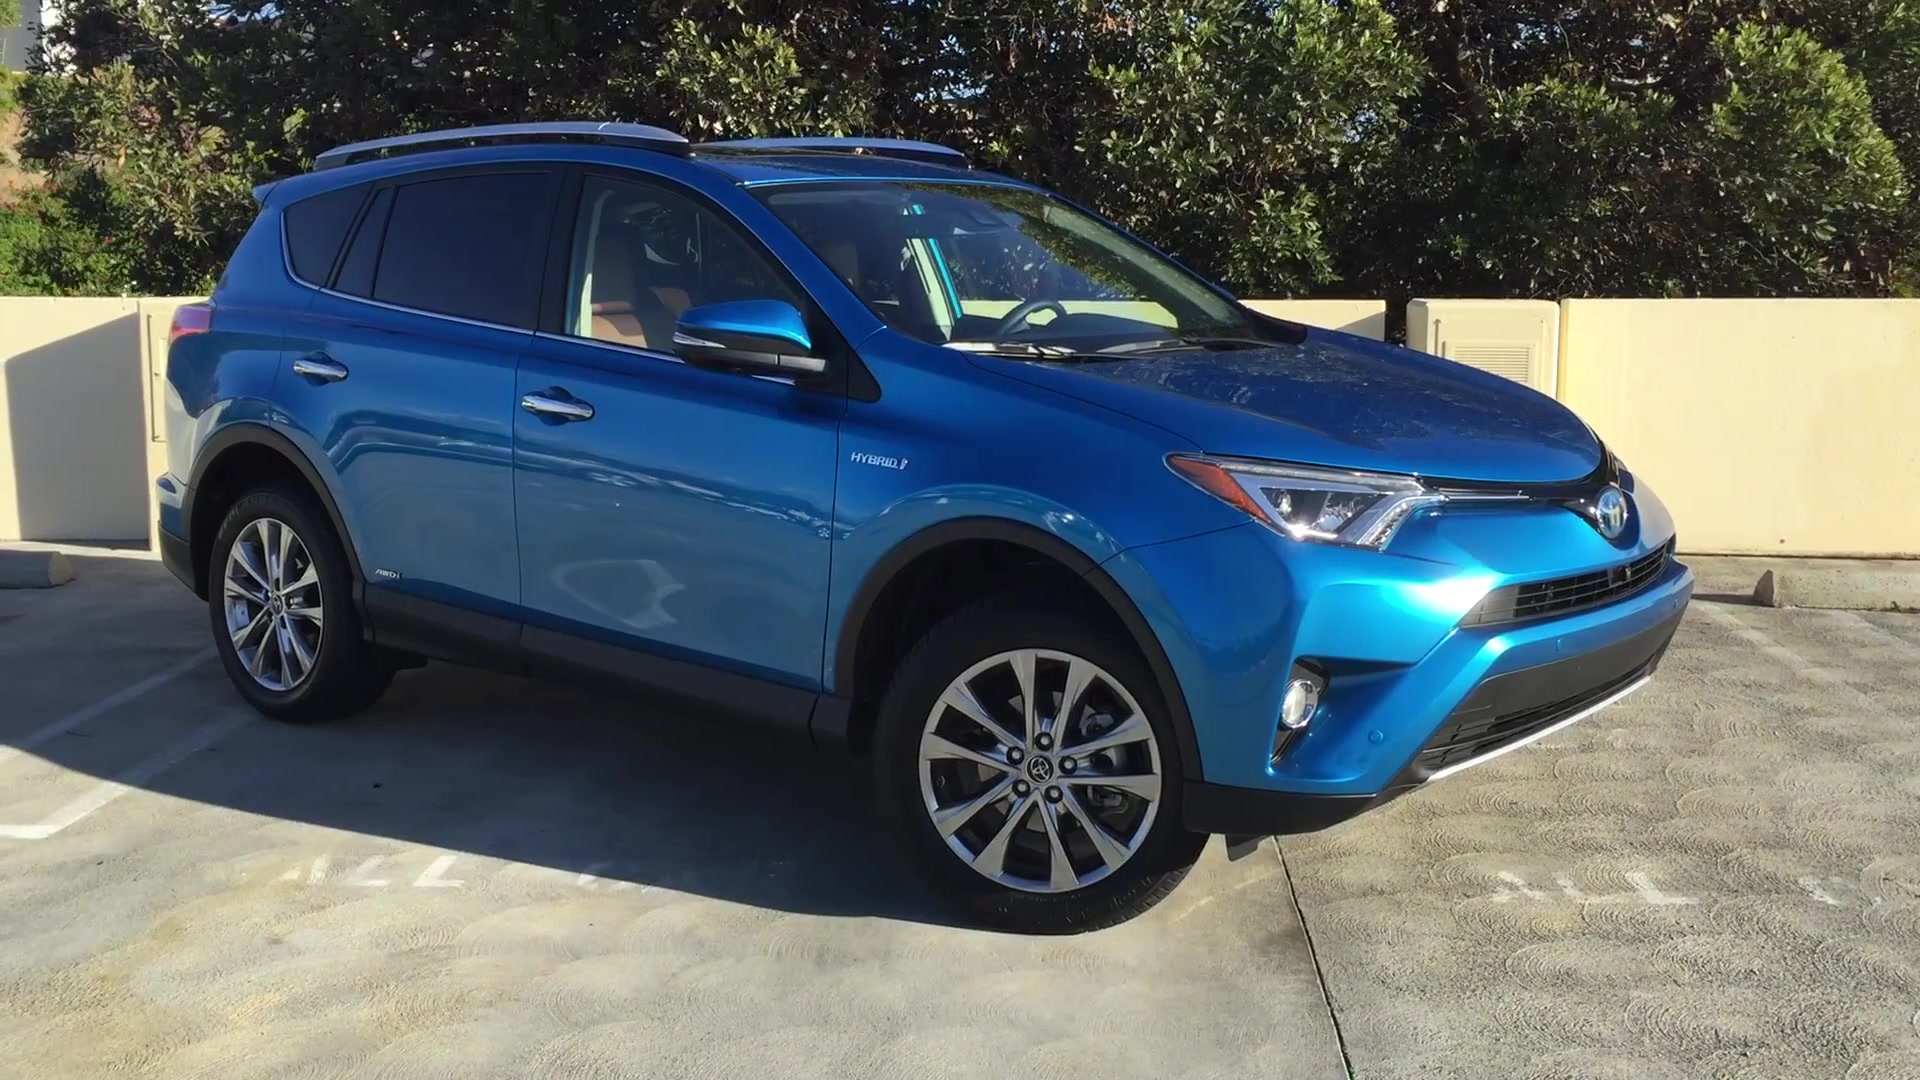 2018 Subaru Crosstrek Vs Mazda Cx 3 >> Toyota RAV4 spy photos show rugged new styling - Autoblog